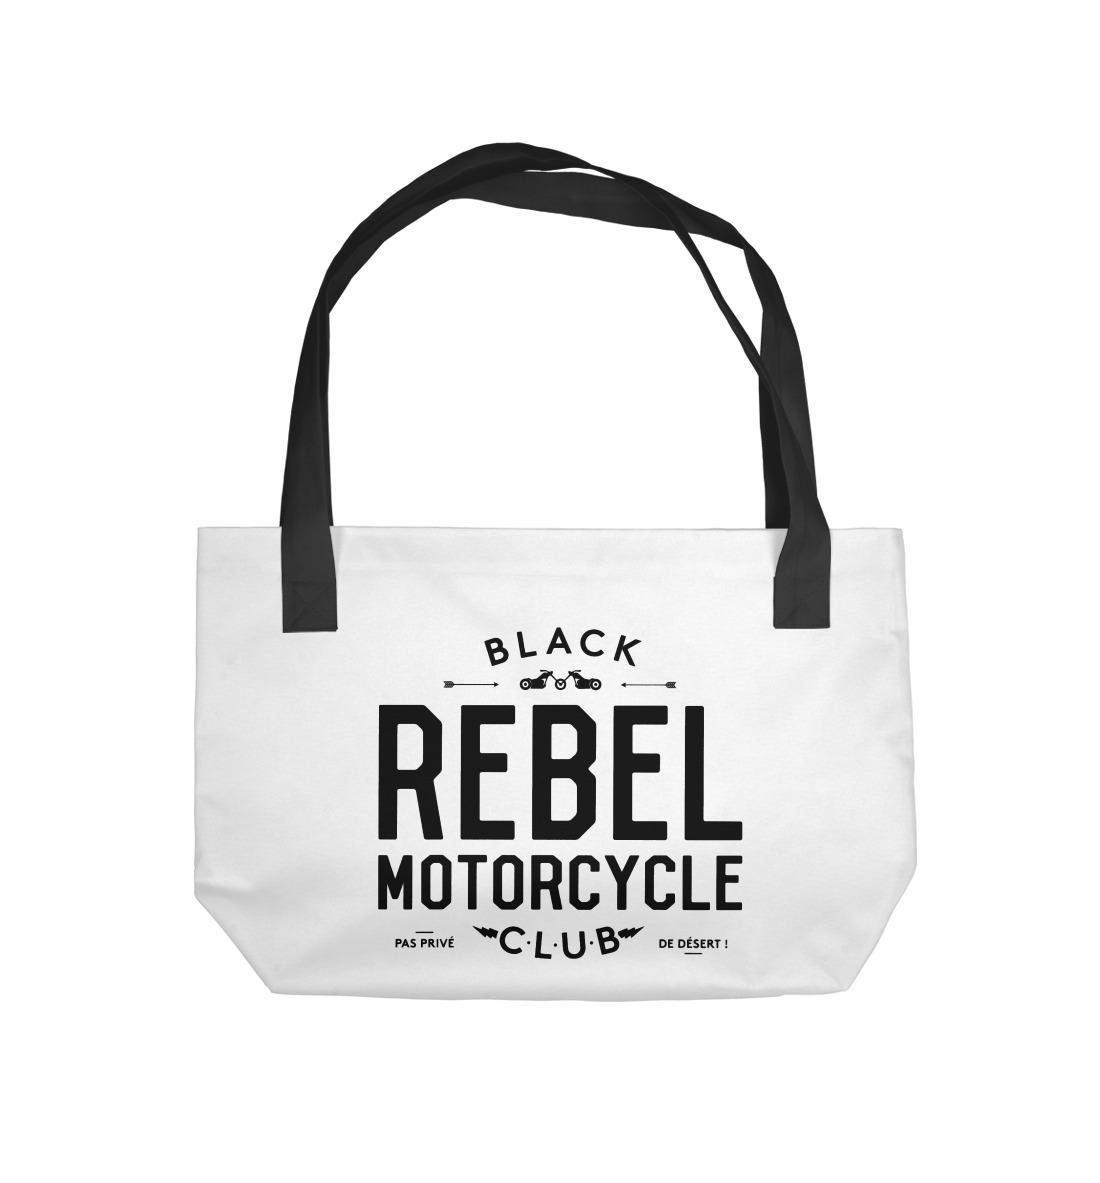 Black Rebel Motorcycle Club printio boroda club black classic